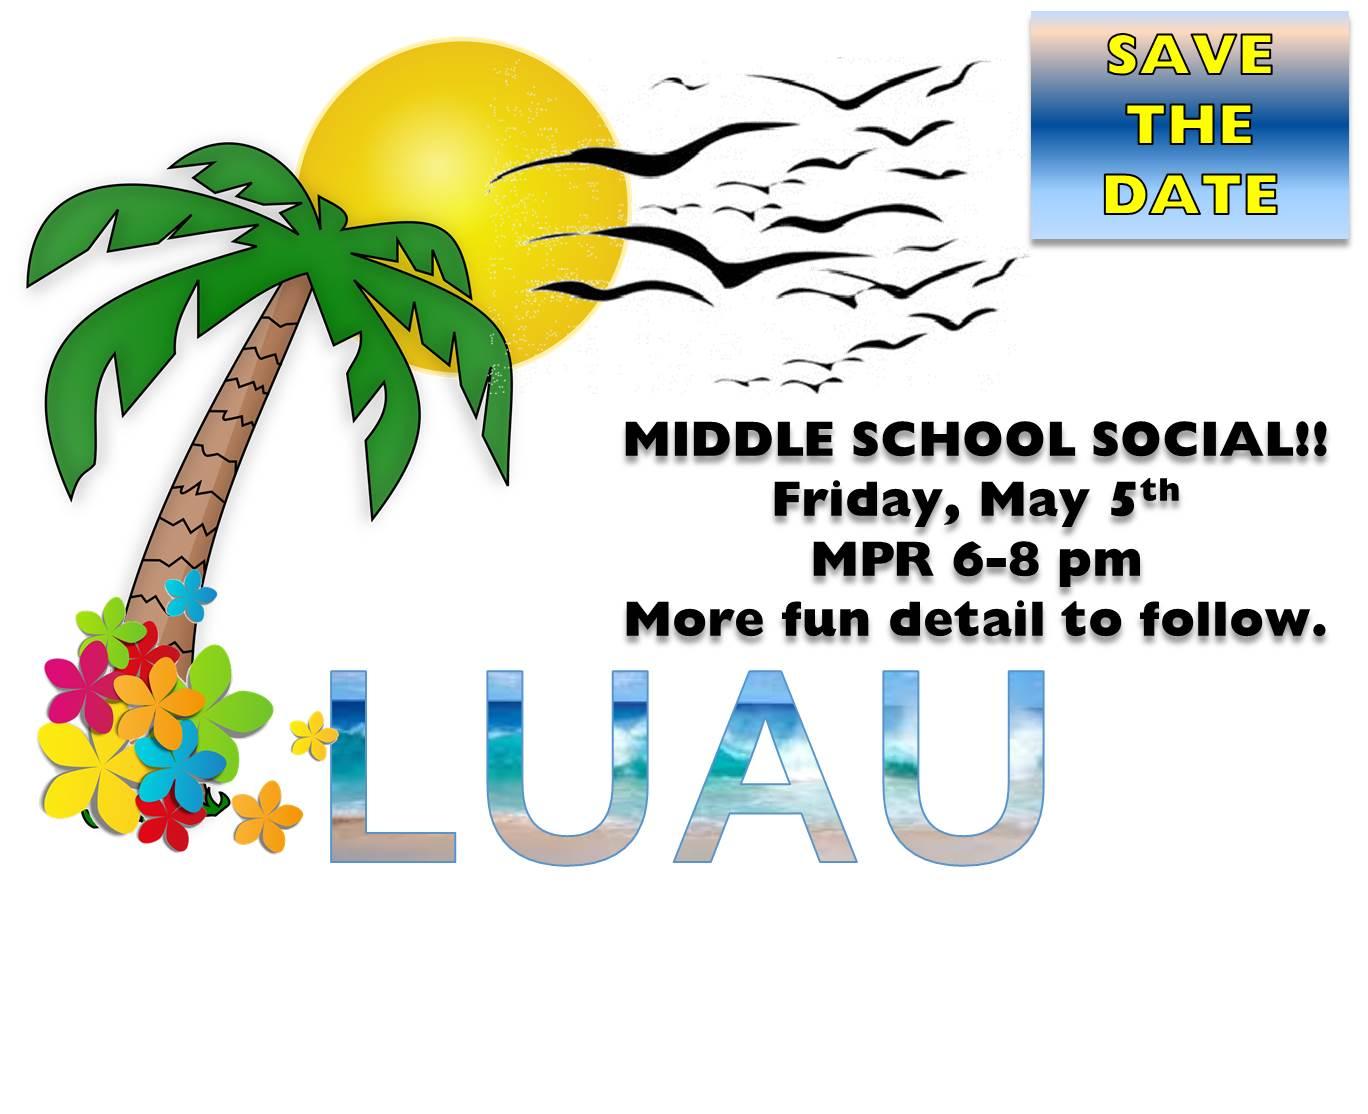 MS-SOCIAL-LUAU-SAVE-THE-DATE.jpg